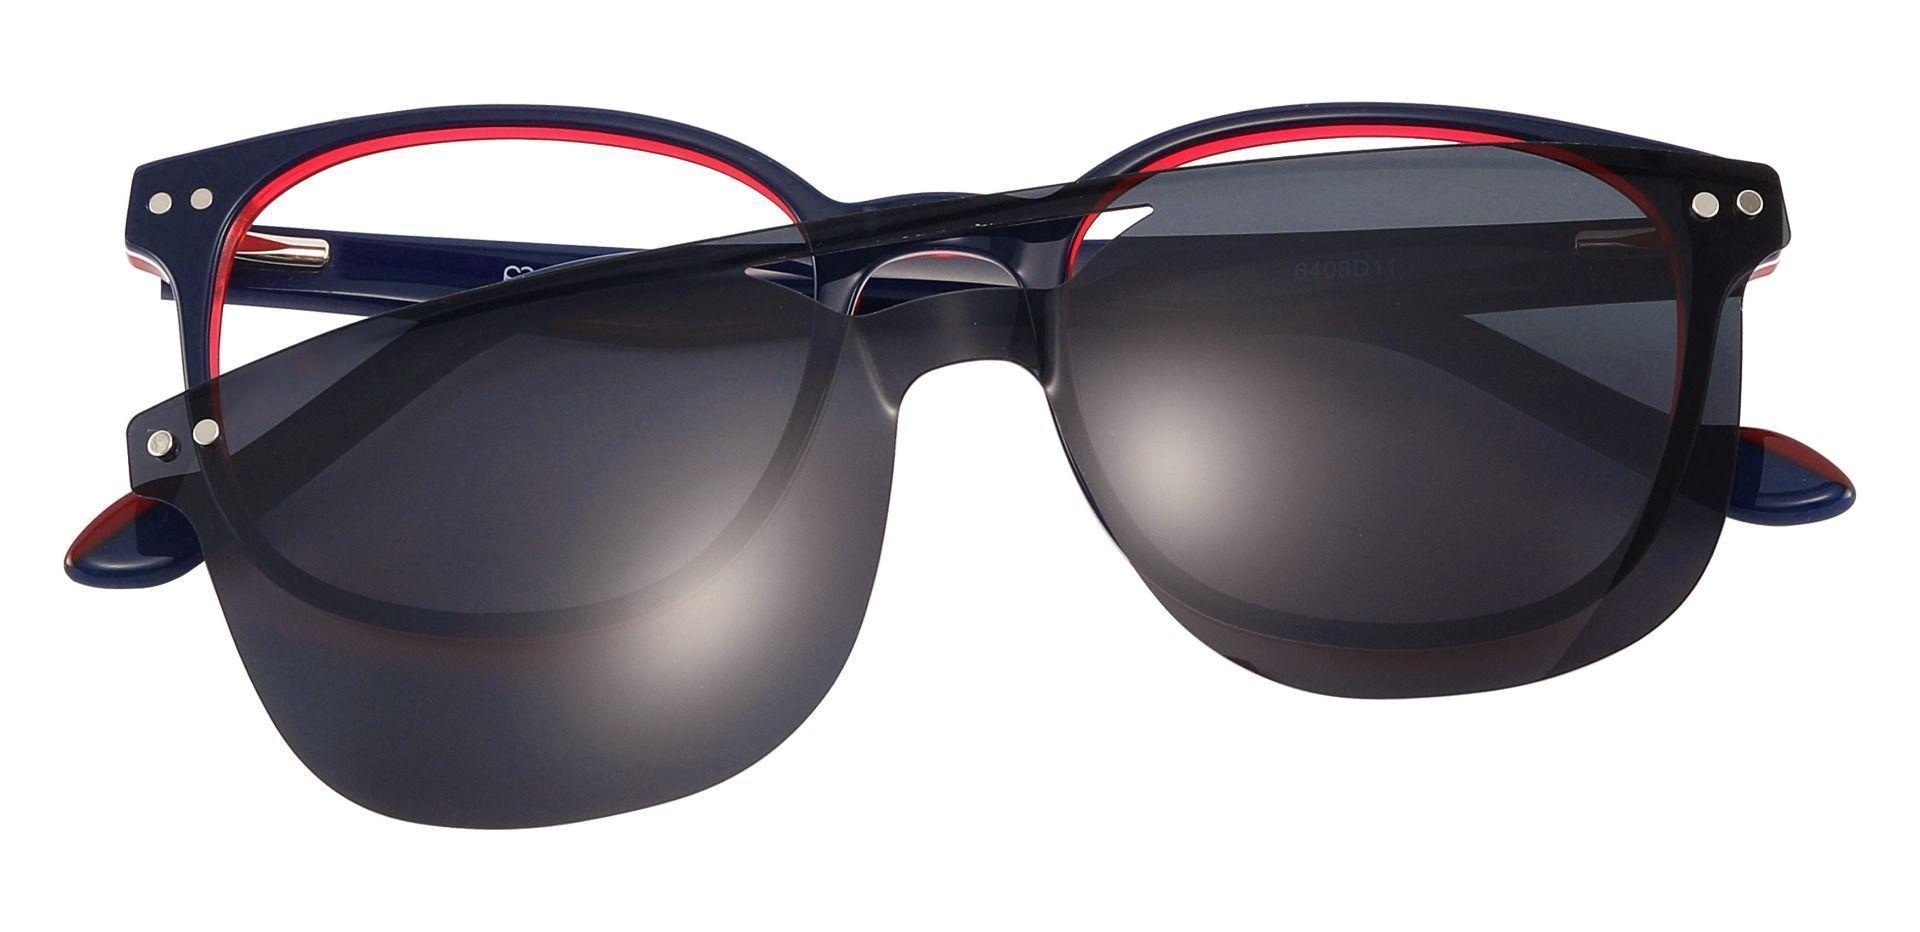 Jena Oval Prescription Glasses - Blue